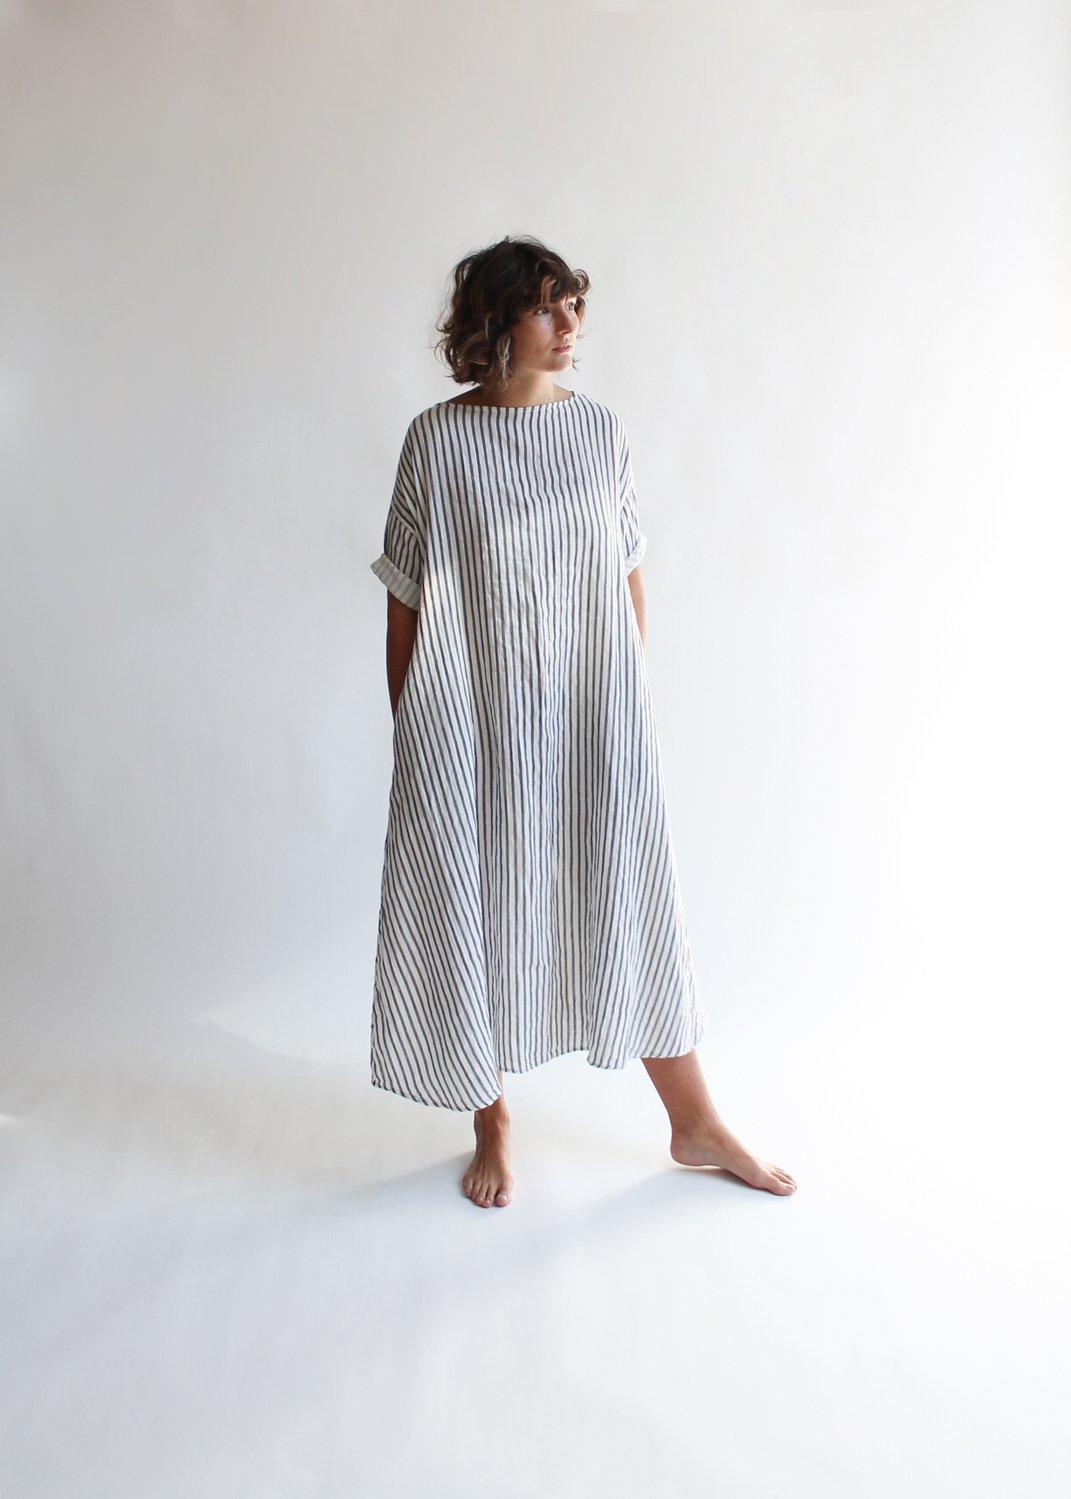 clothing-41_1500x1500.jpg